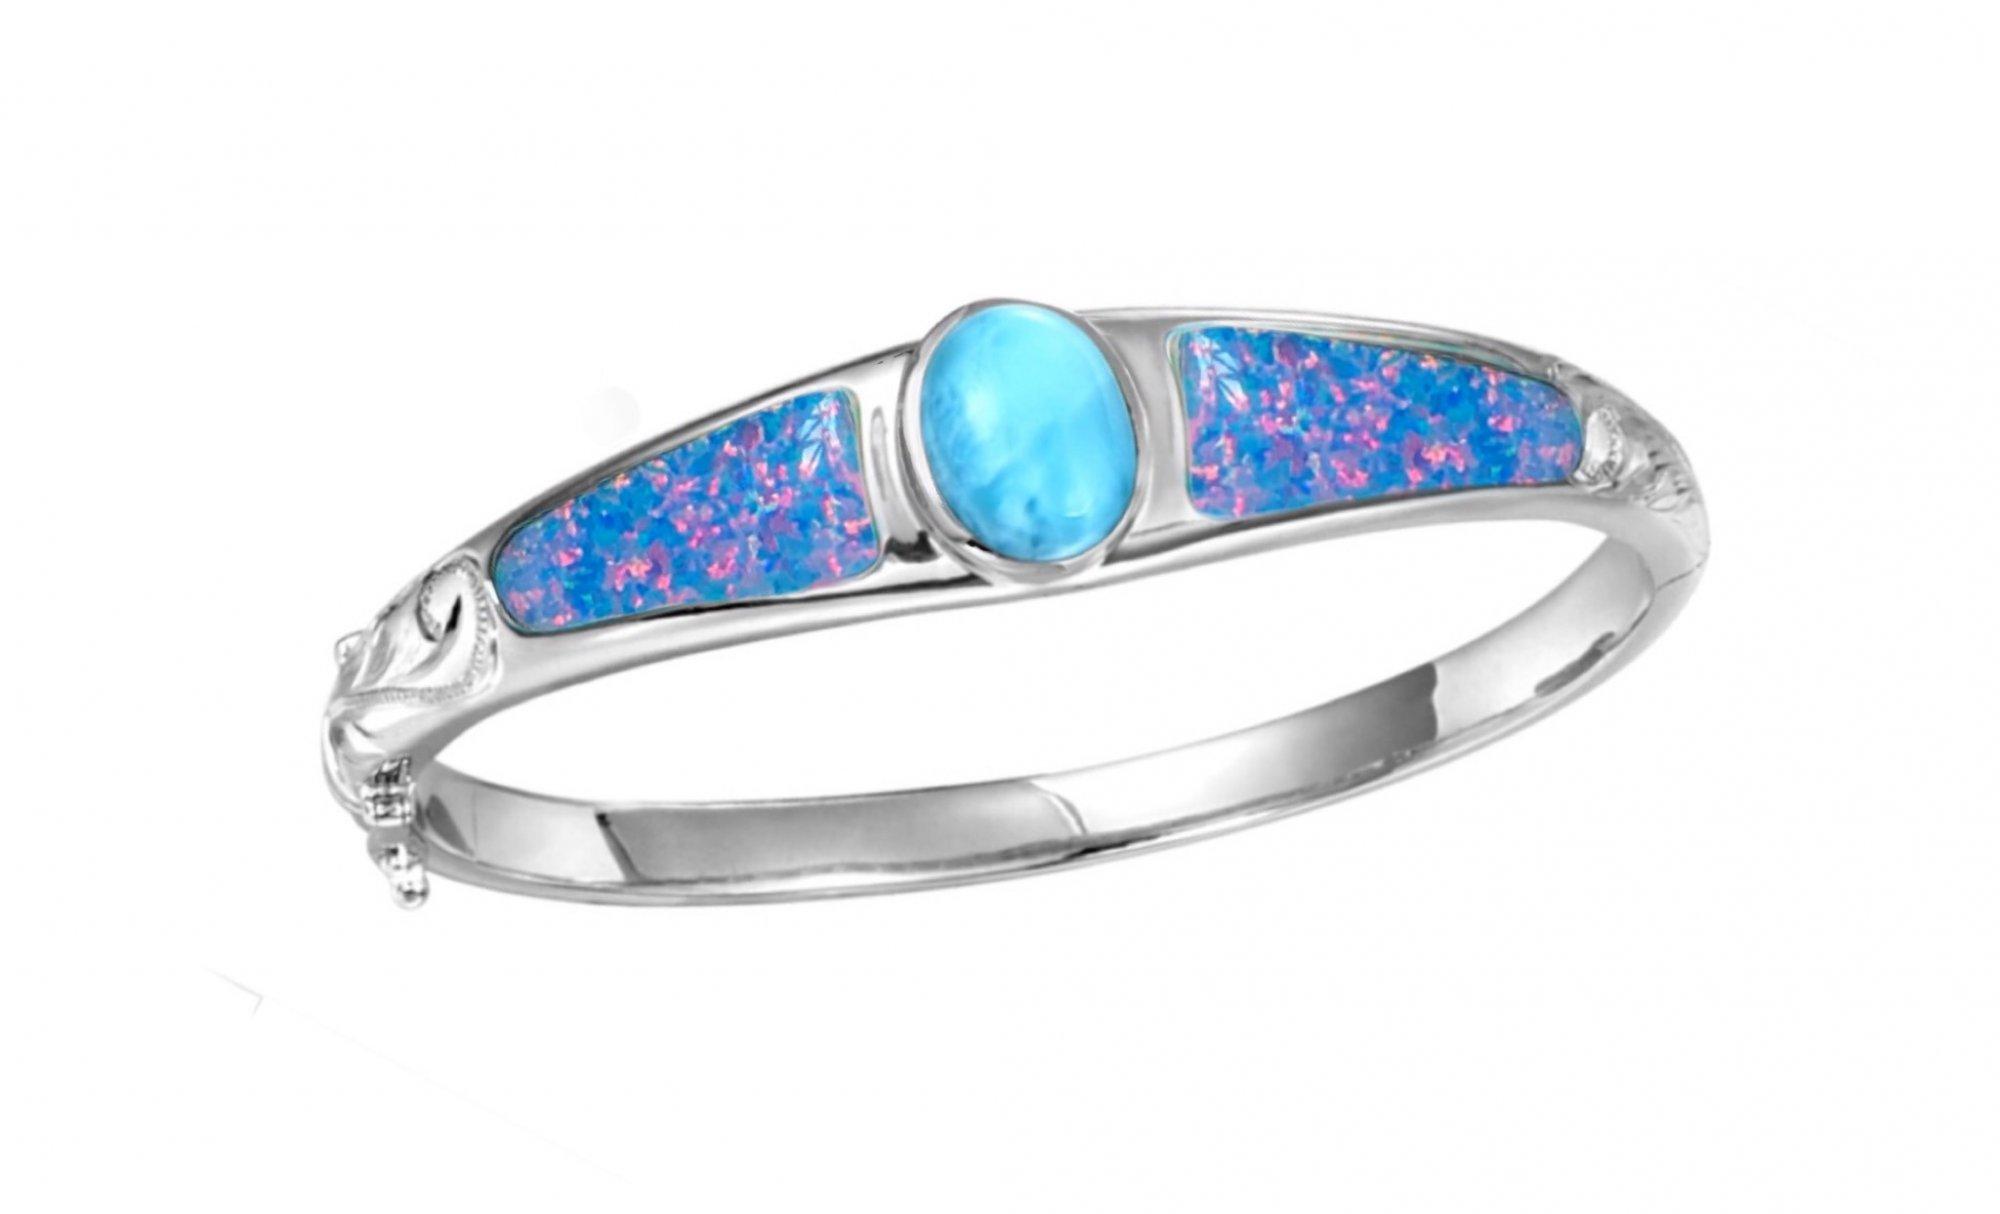 Larimar with Fire Opal & has Plumeria Queen Scroll Bracelet